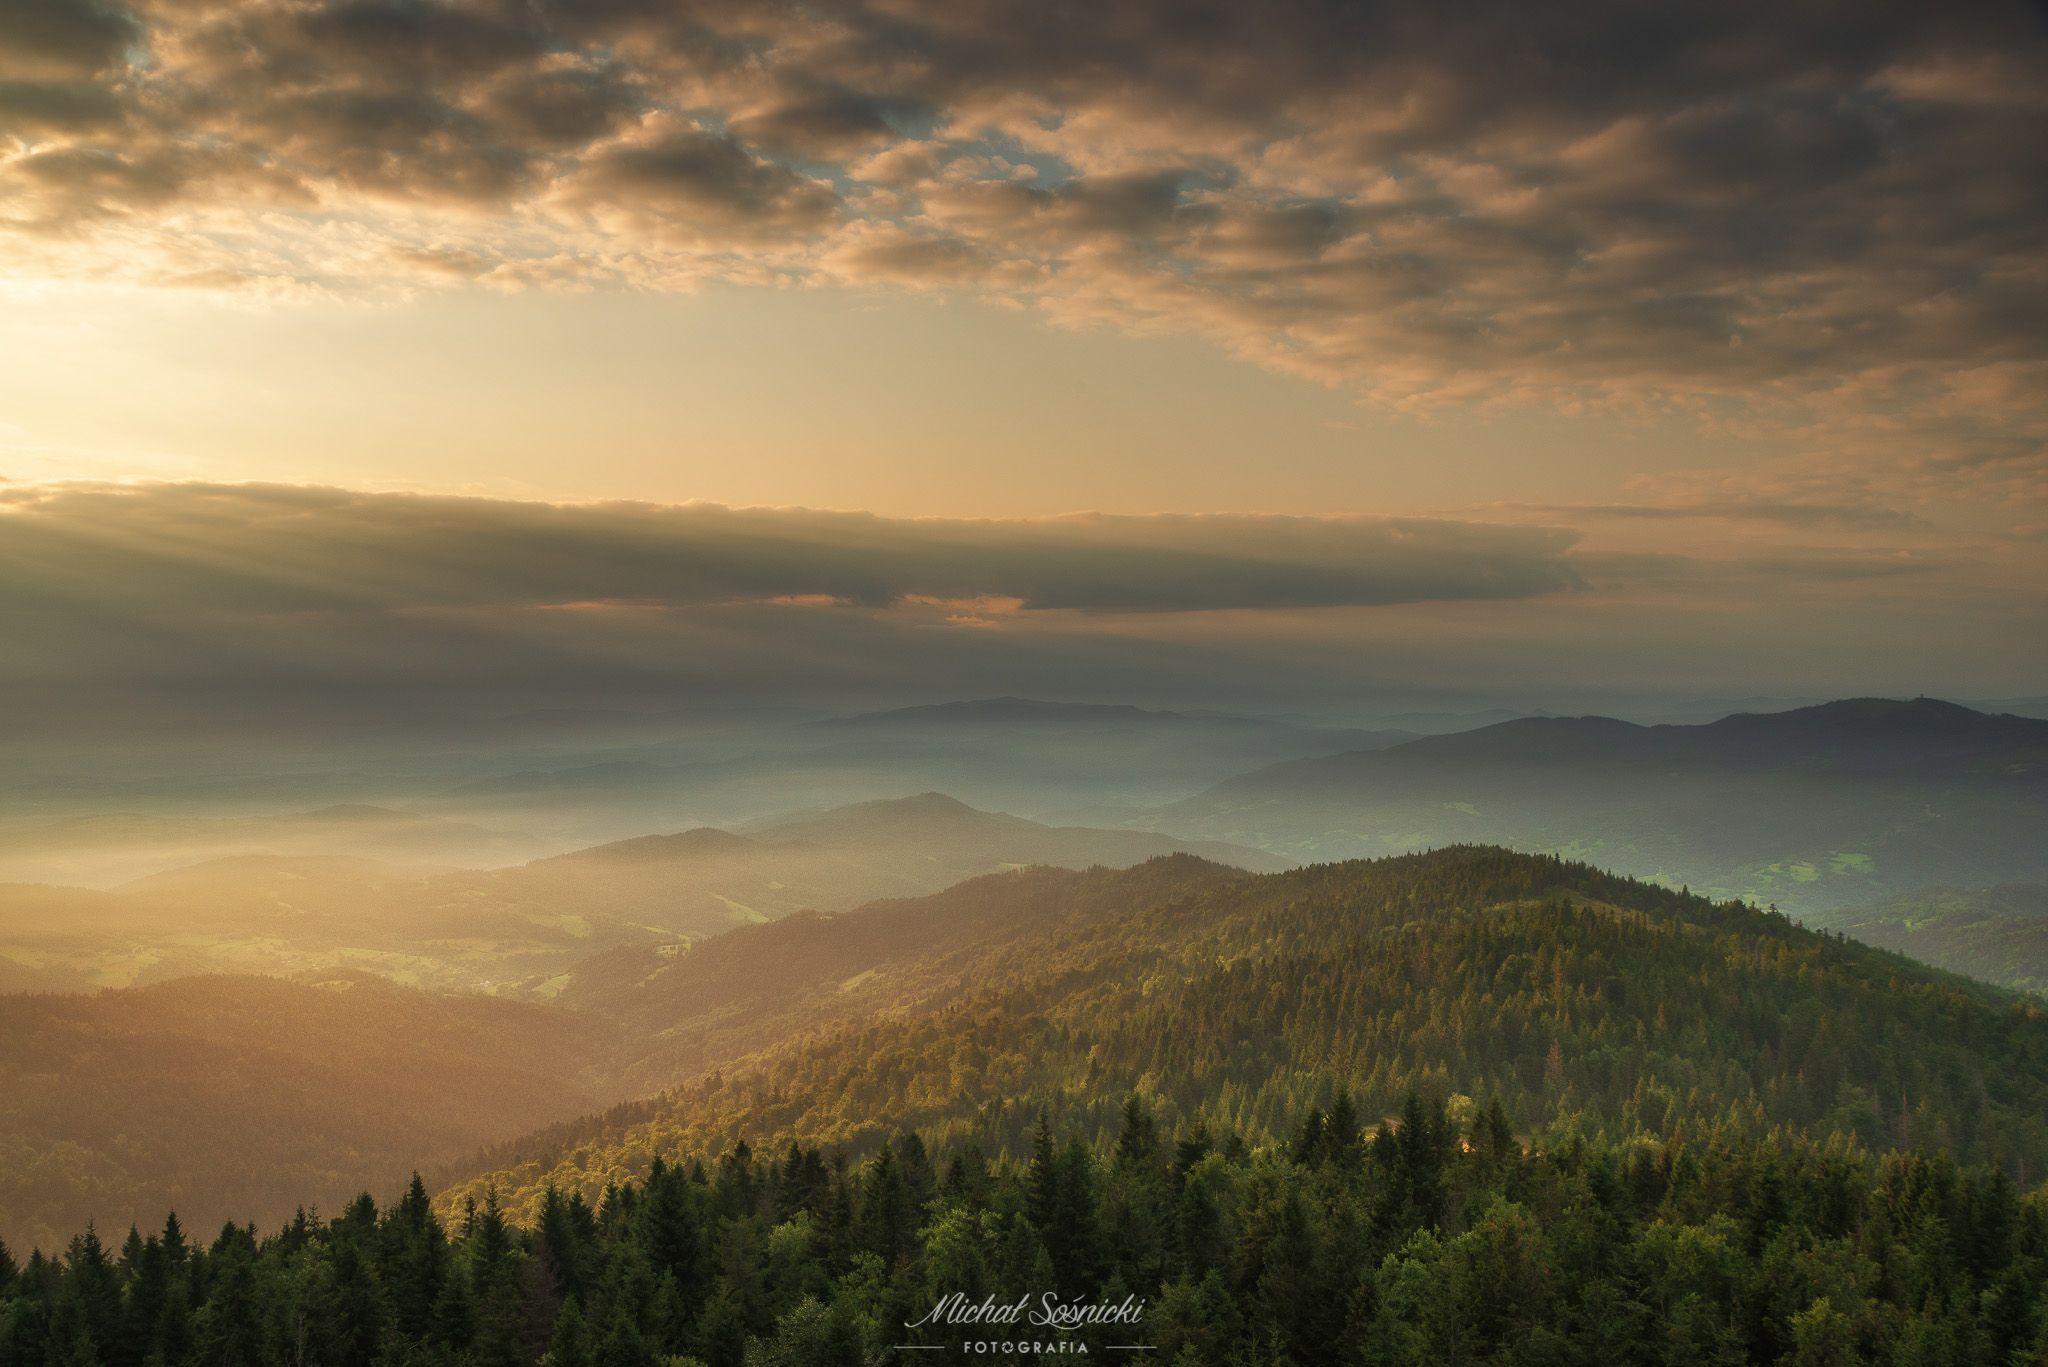 #sunrise #poland #summer #gorc #pentax #benro #sky #clouds #mountains, Sośnicki Michał